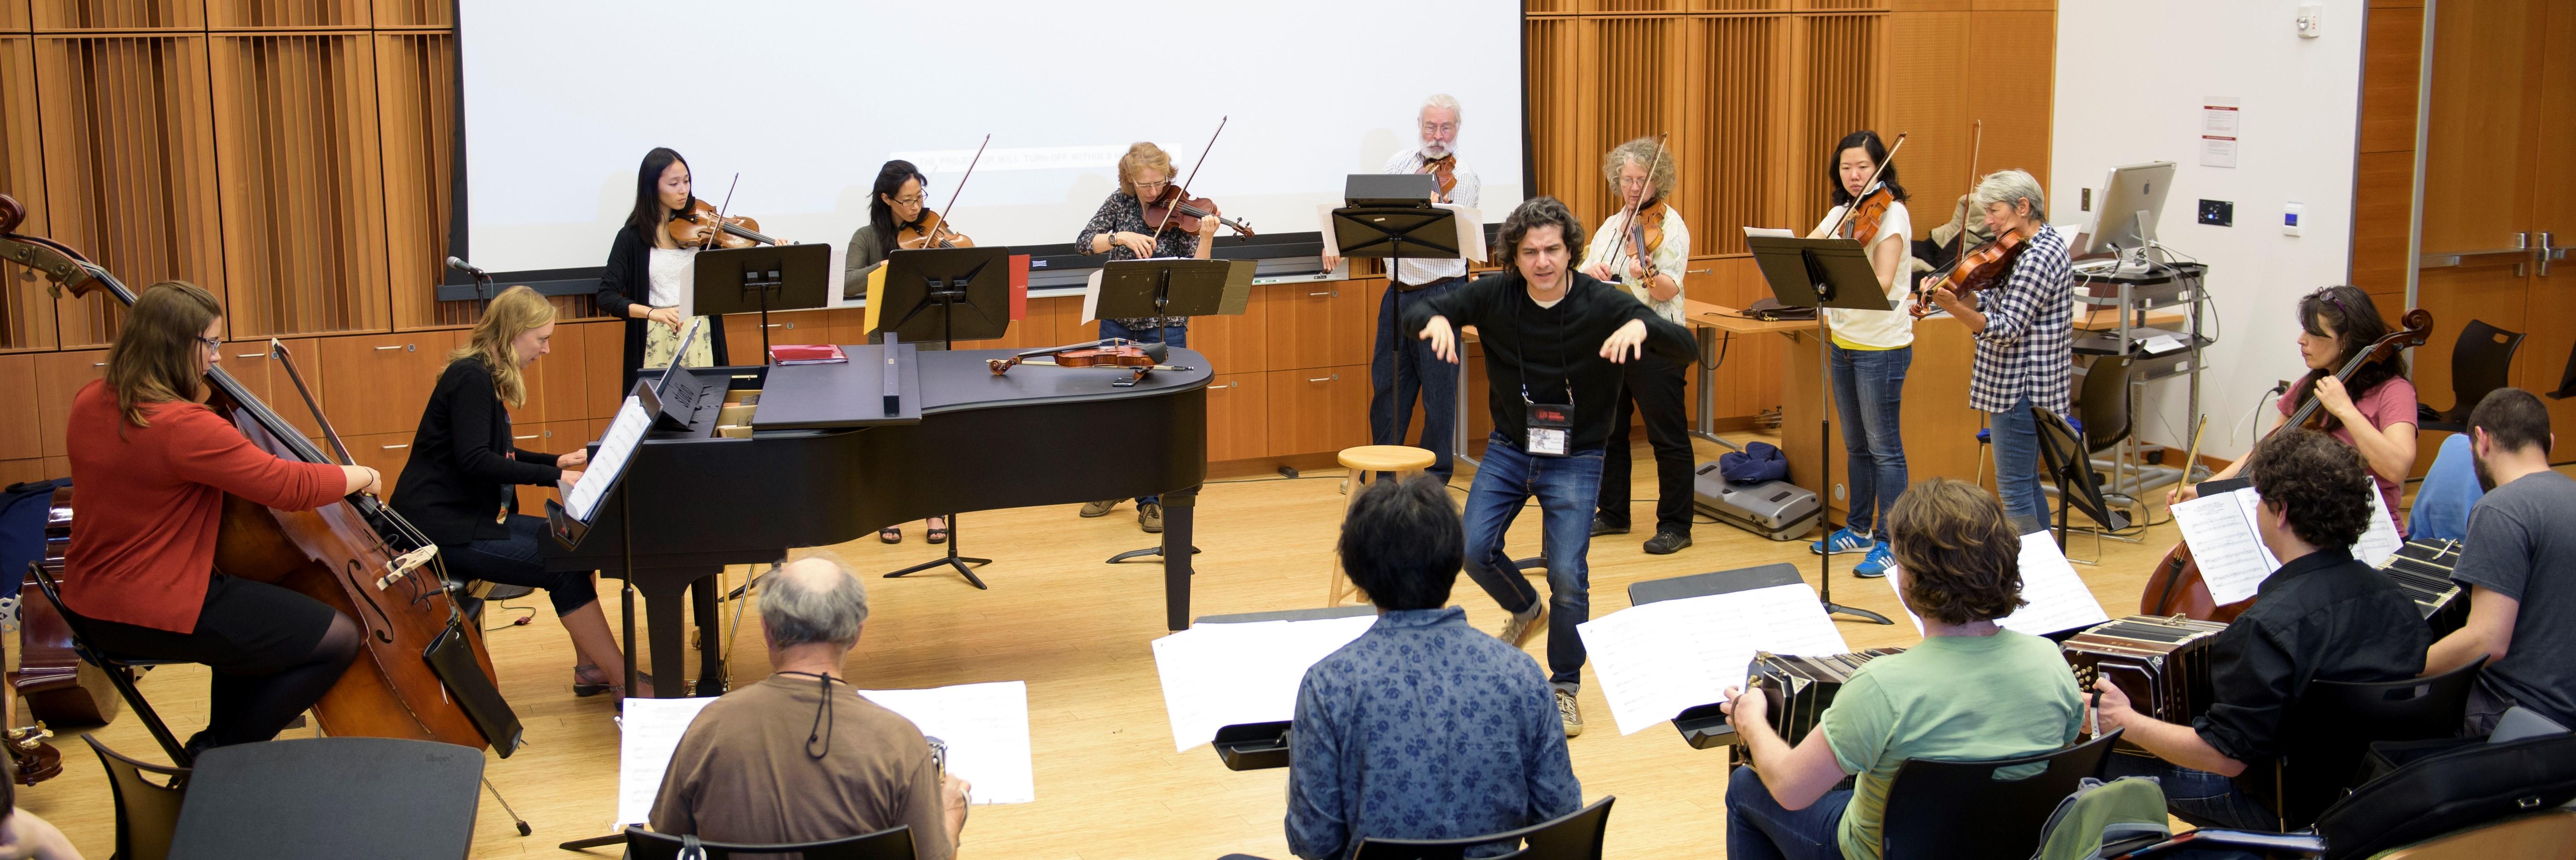 Orquesta Típica rehearsal